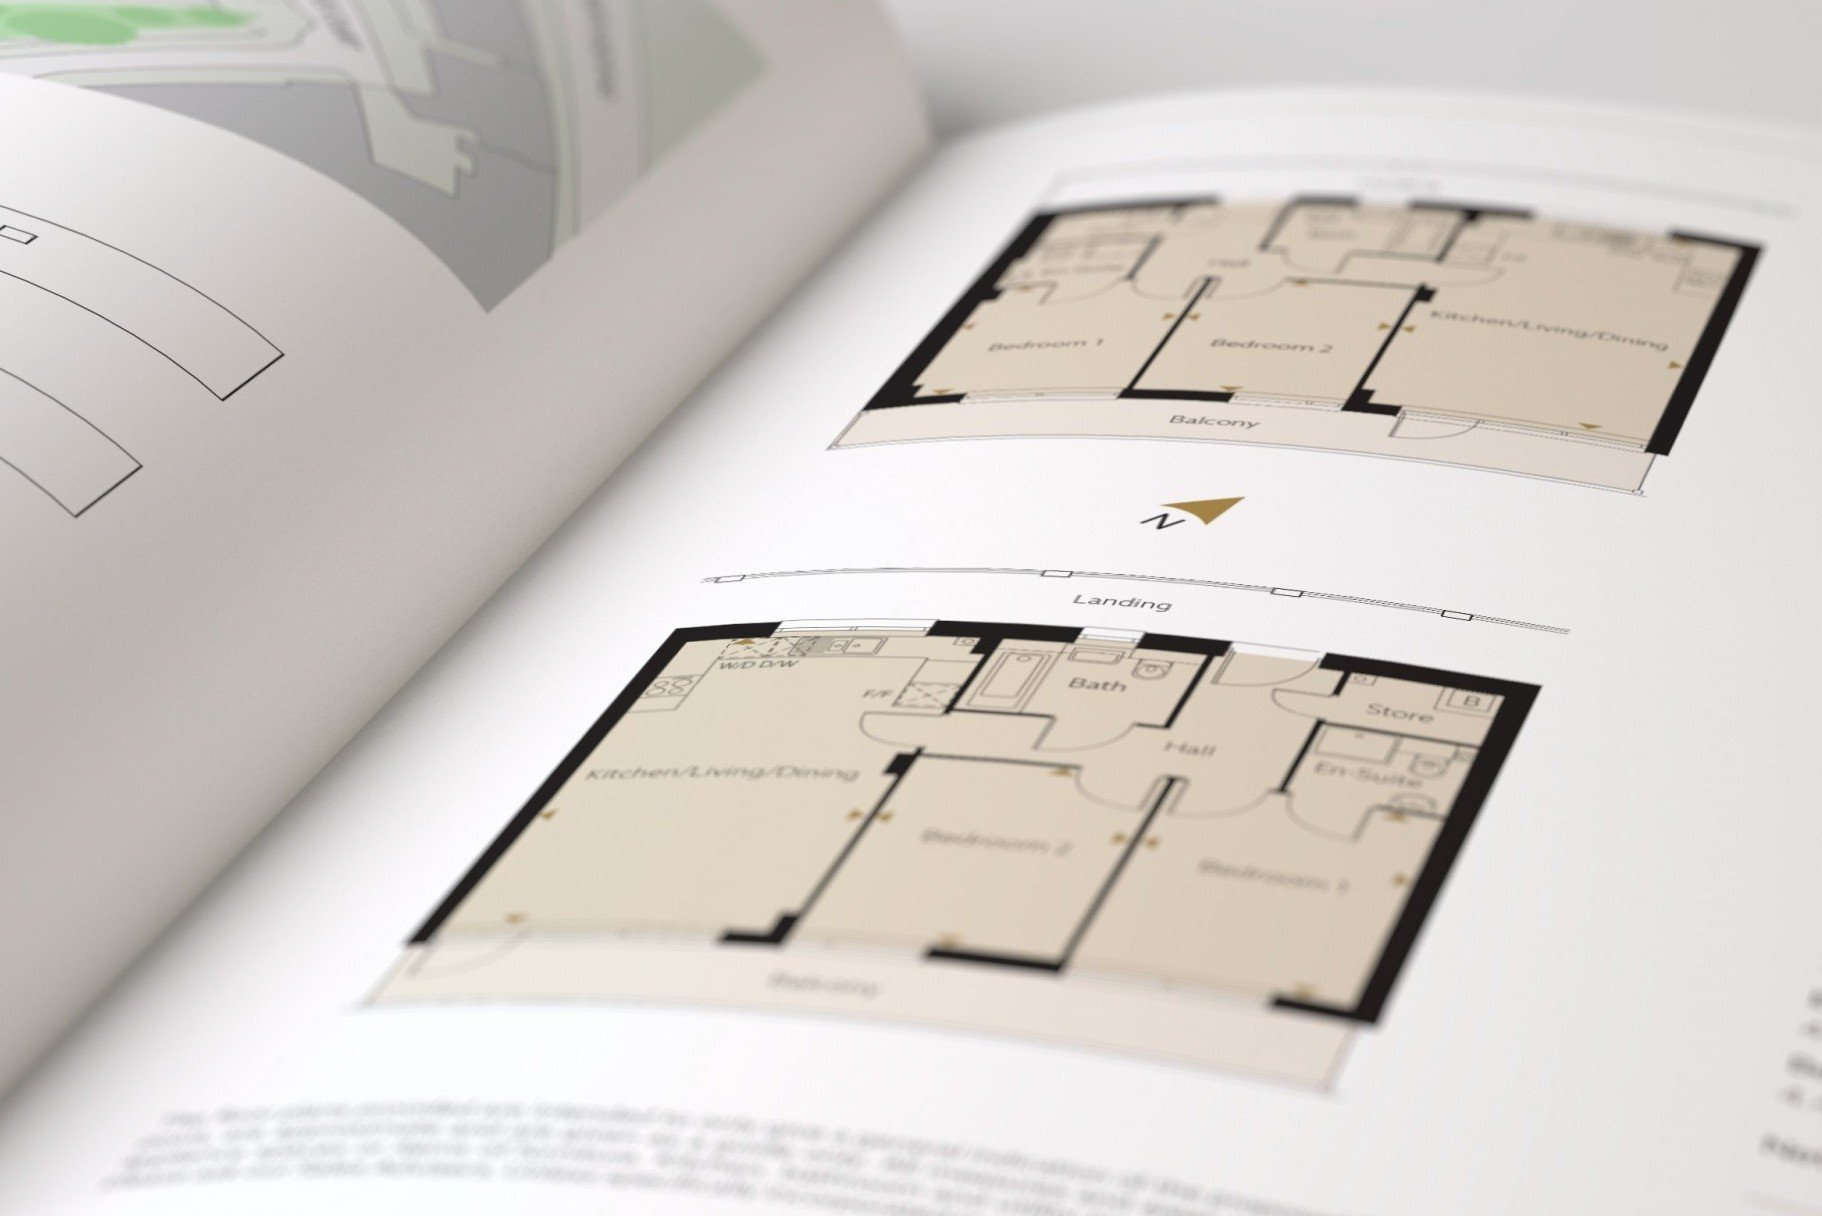 The Apex Tile 005